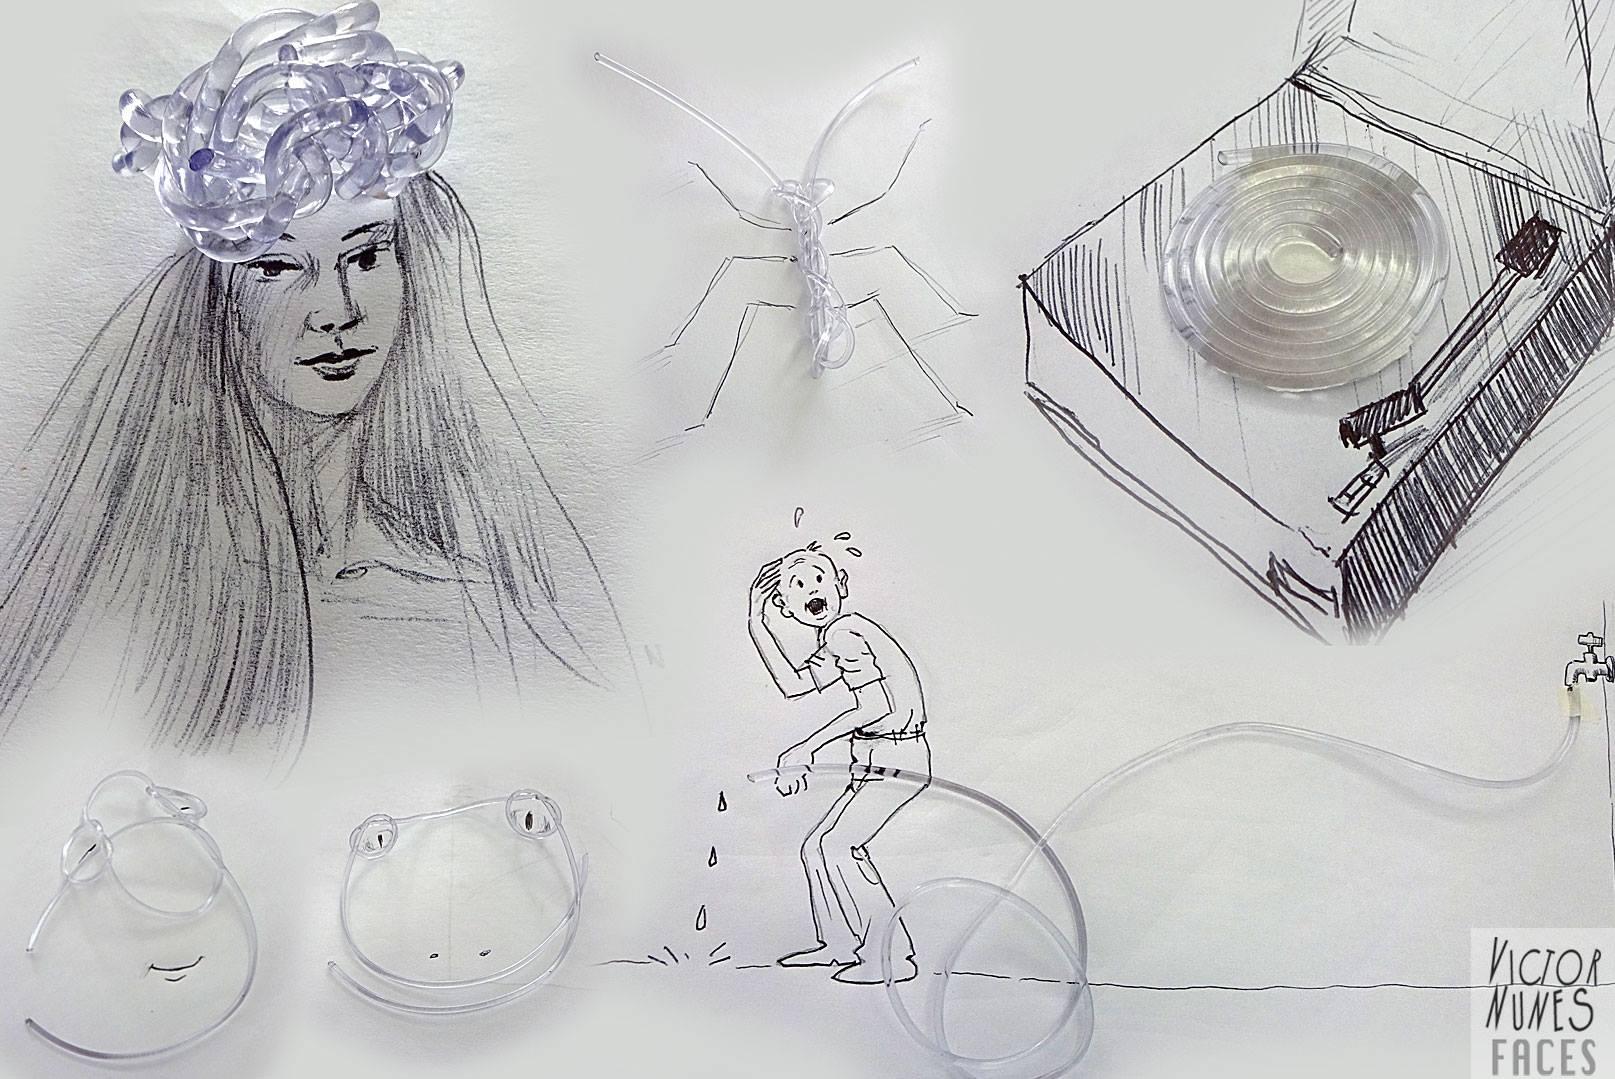 objetos con ilustracion oldskull 7